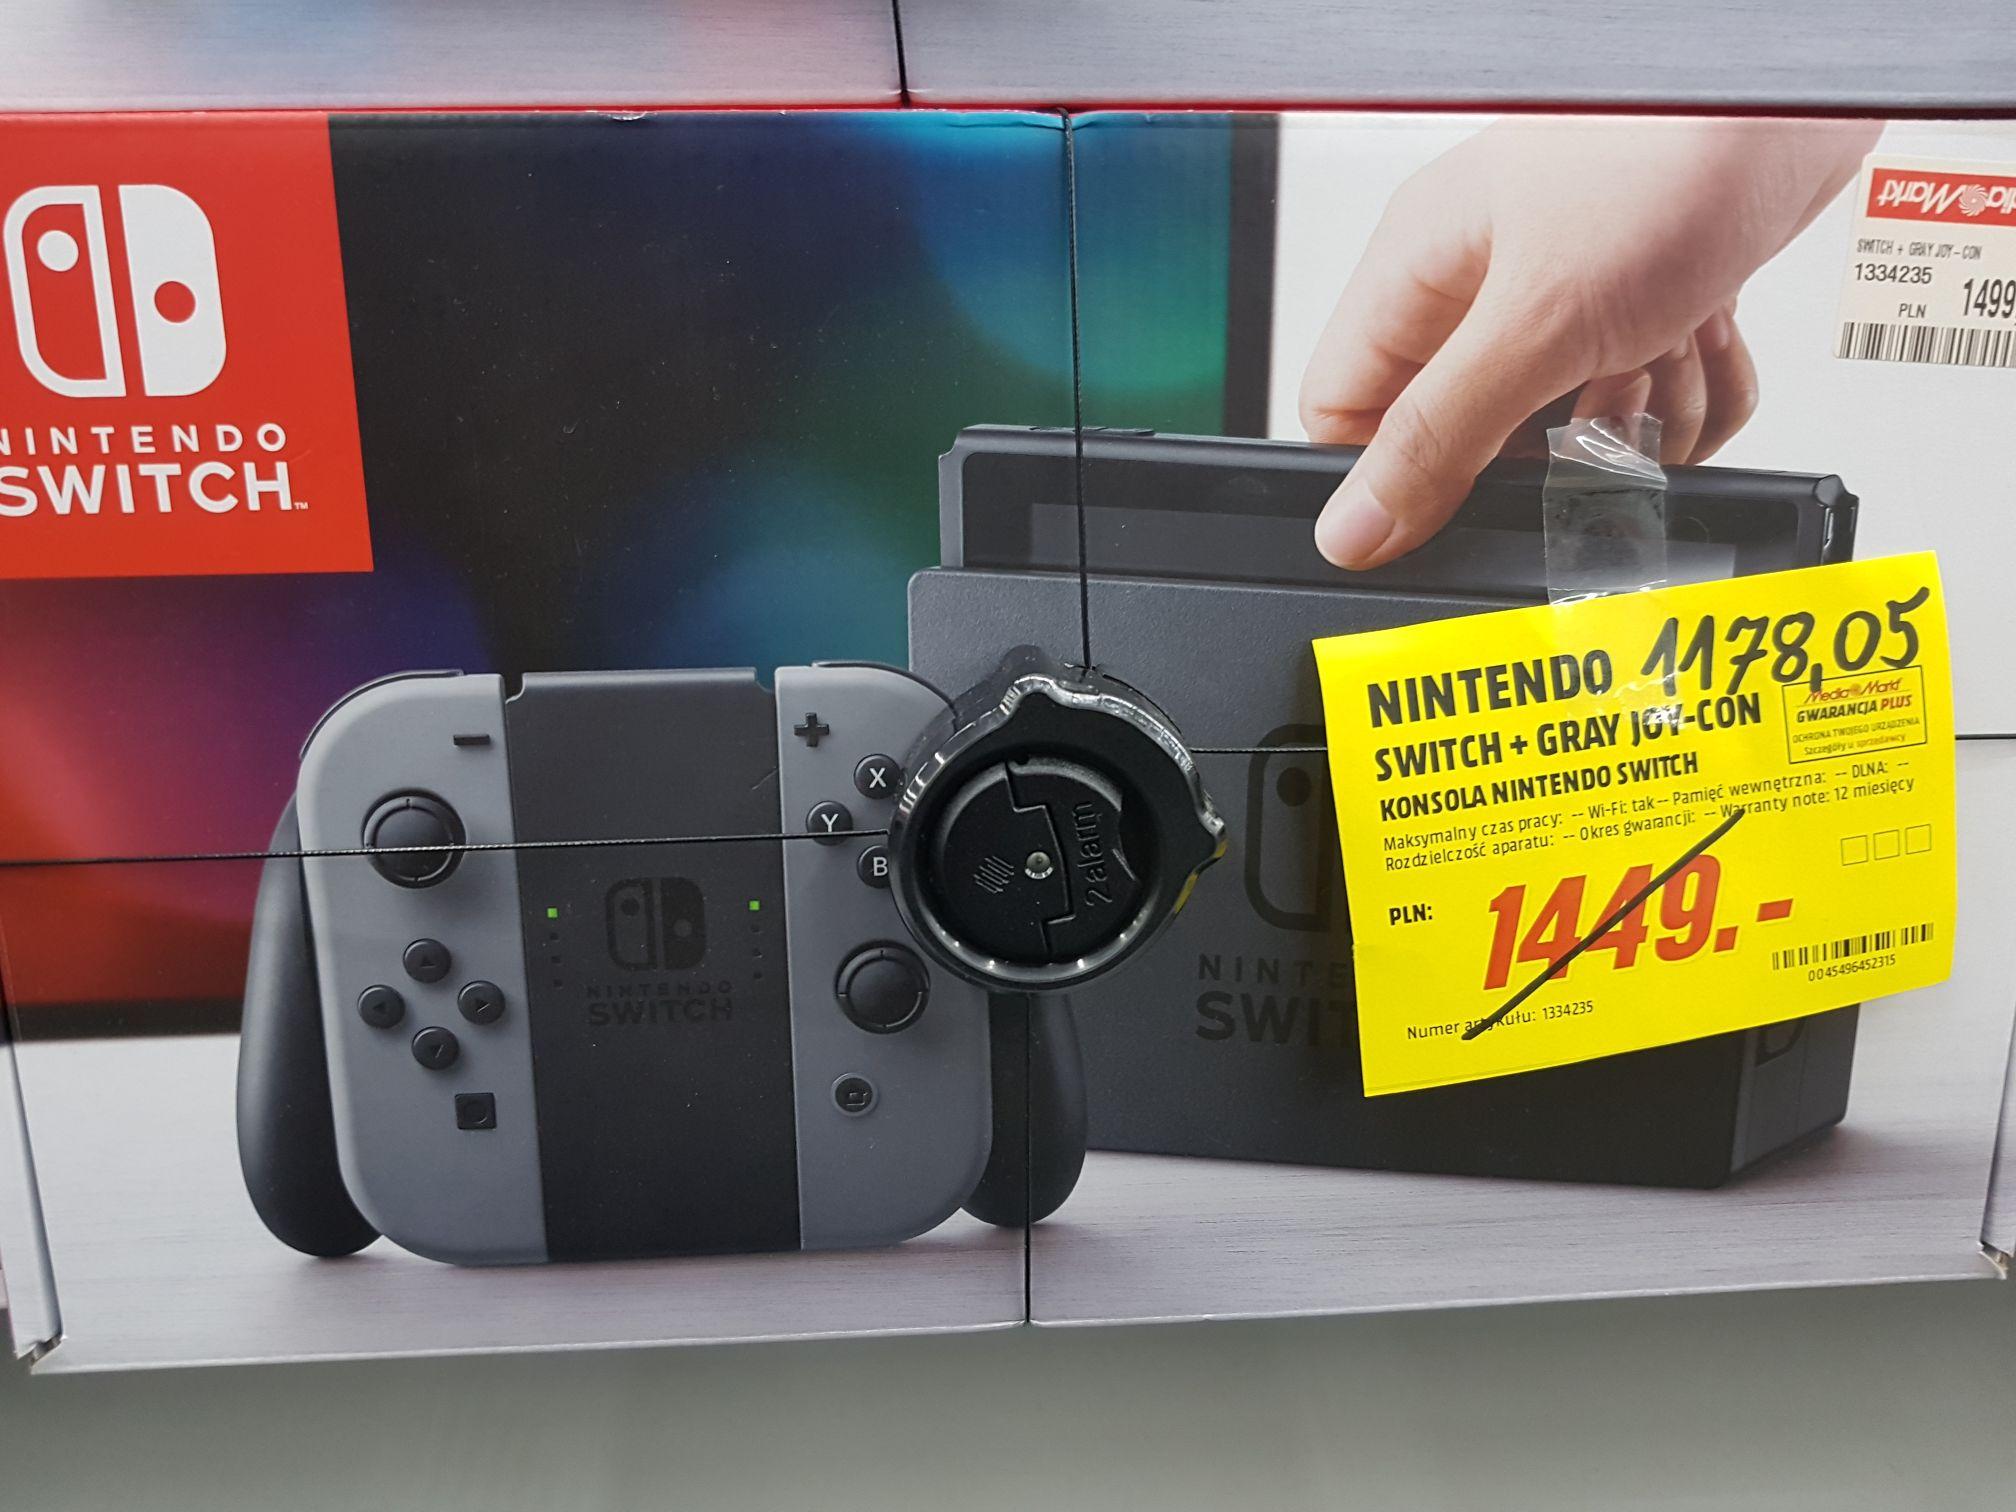 Nintendo switch w mediamarkt (Siedlce)